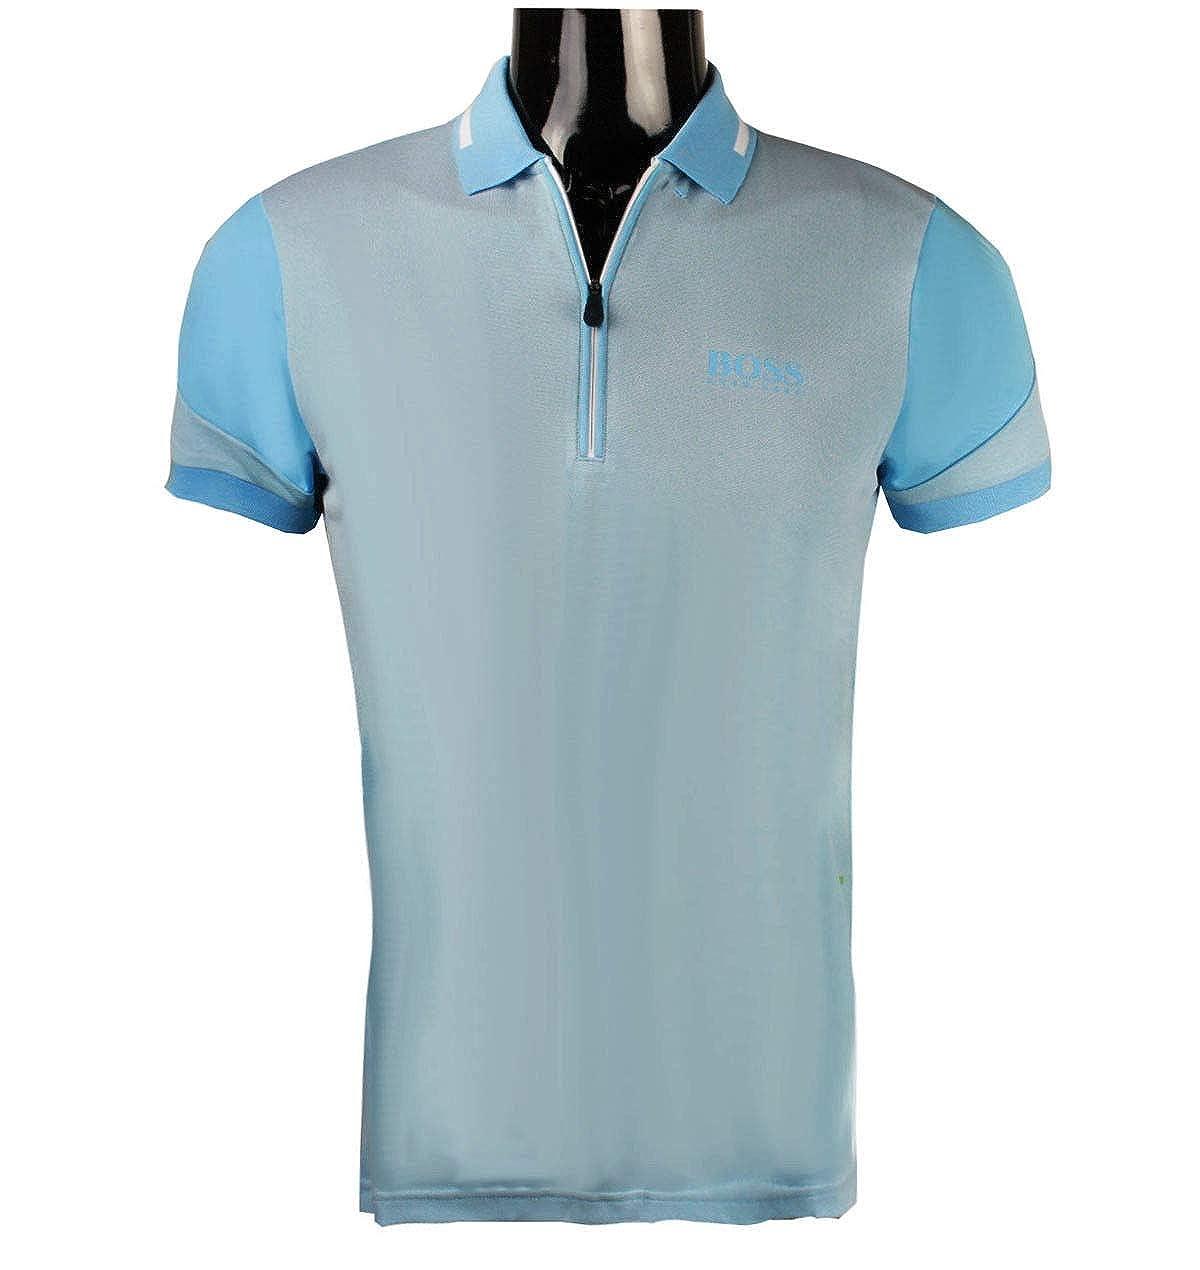 42c6ade8 Hugo Boss Mens Polo T Shirts - DREAMWORKS